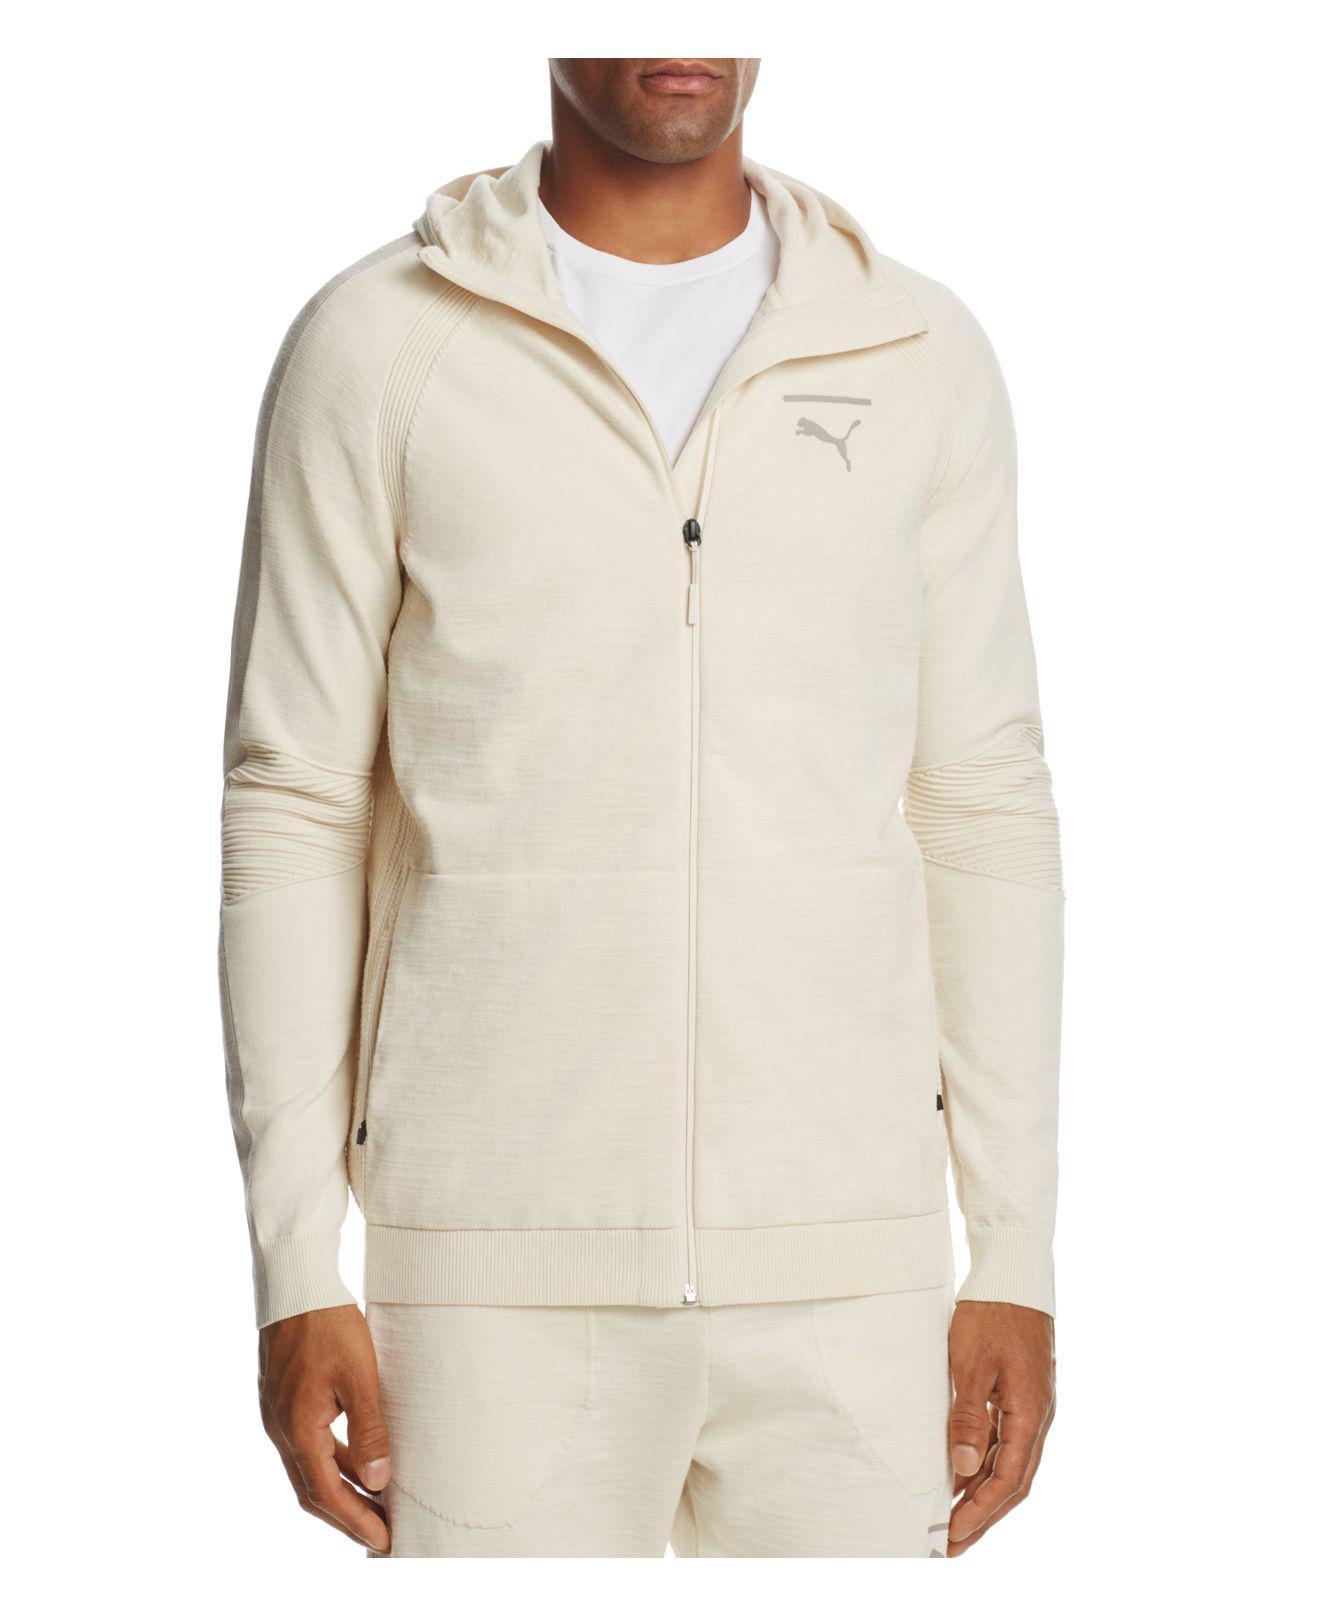 PUMA. Men's White Evoknit Move Zip Hooded Sweatshirt